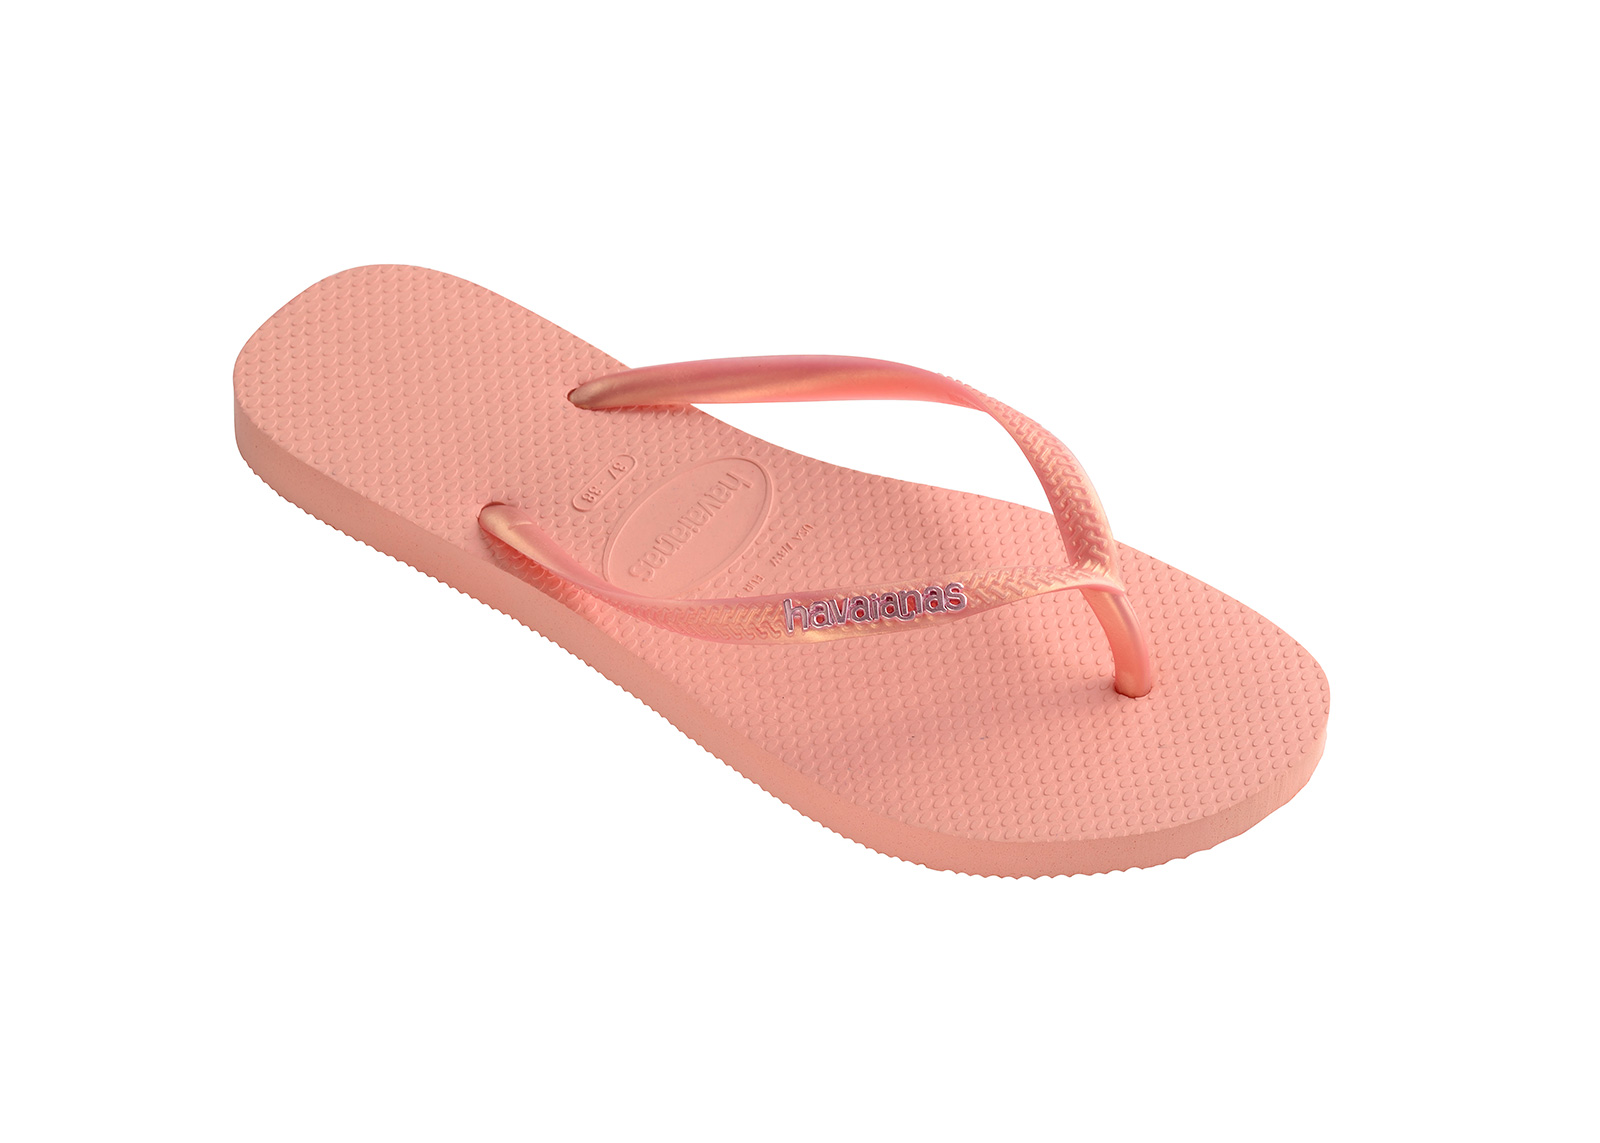 641d5806a94184 Flip-Flops Pink Flip Flops - Havaianas Slim Logo Metallic Light Pink